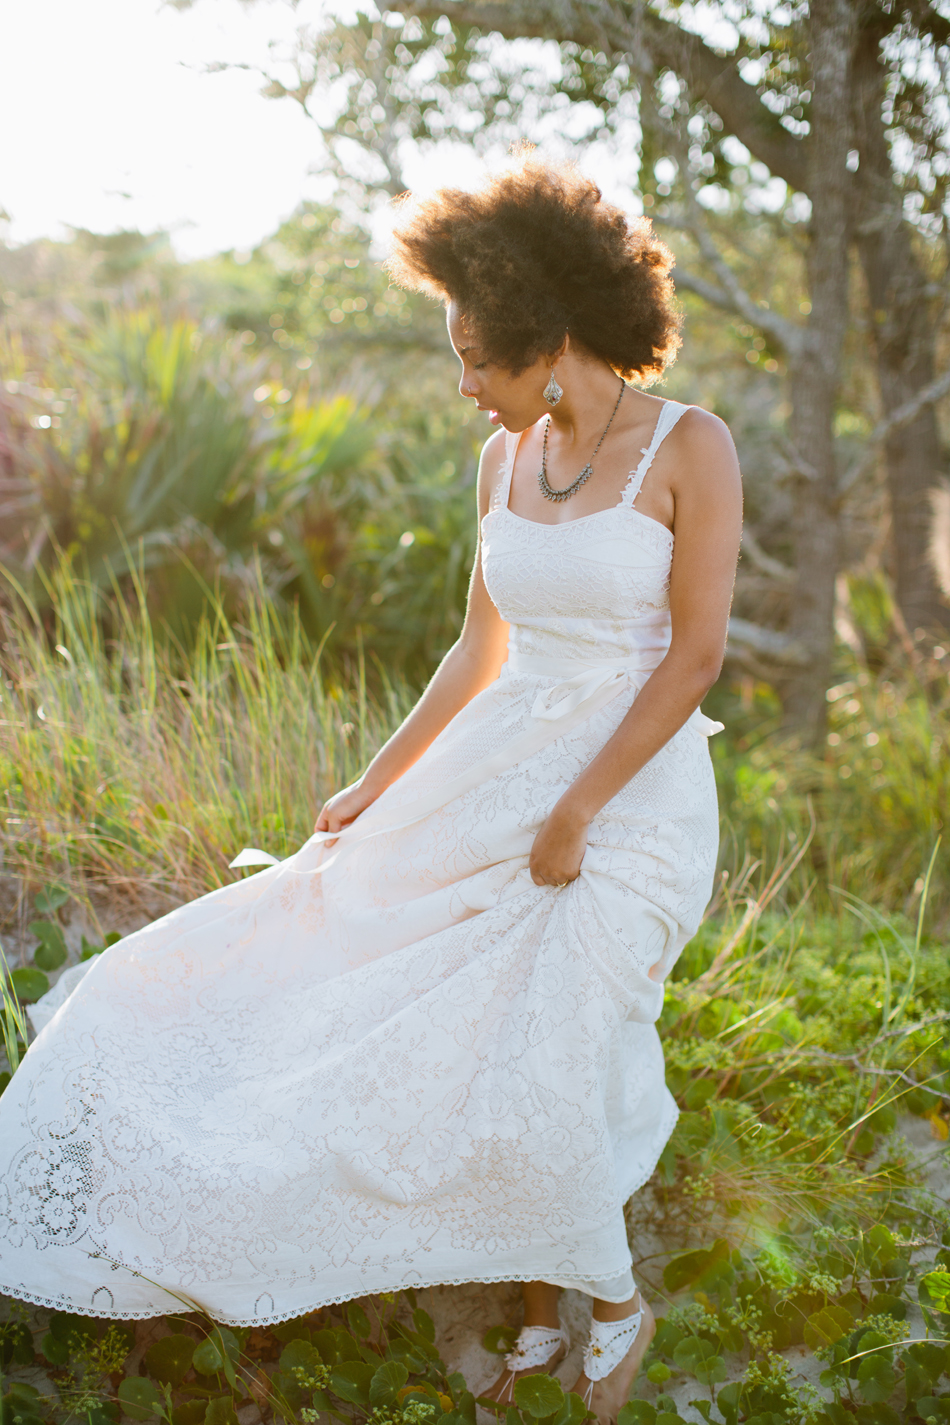 Jameykay_arlie_bohemian_elopement_styled_shoot033.jpg